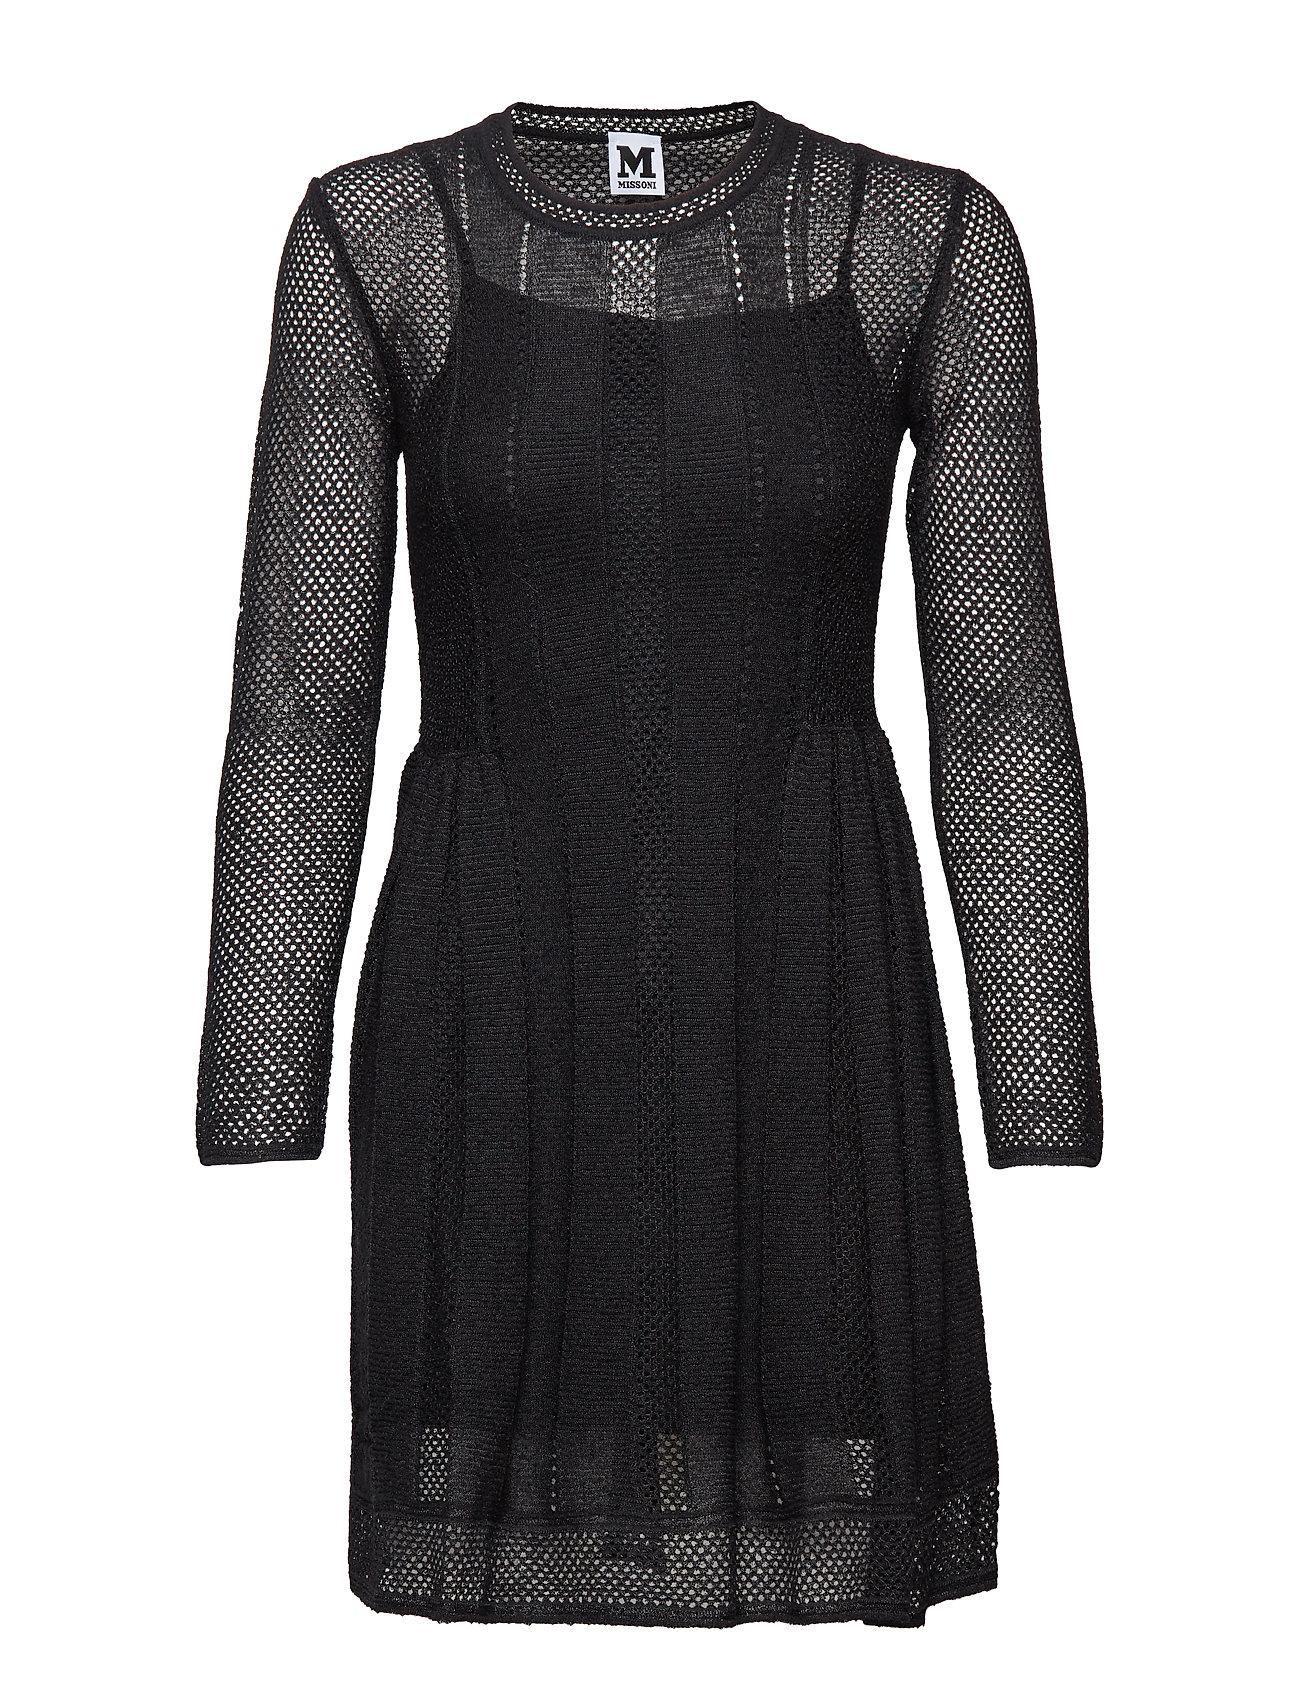 Image of M Missoni-Dress Knælang Kjole Sort M Missoni (3109299123)